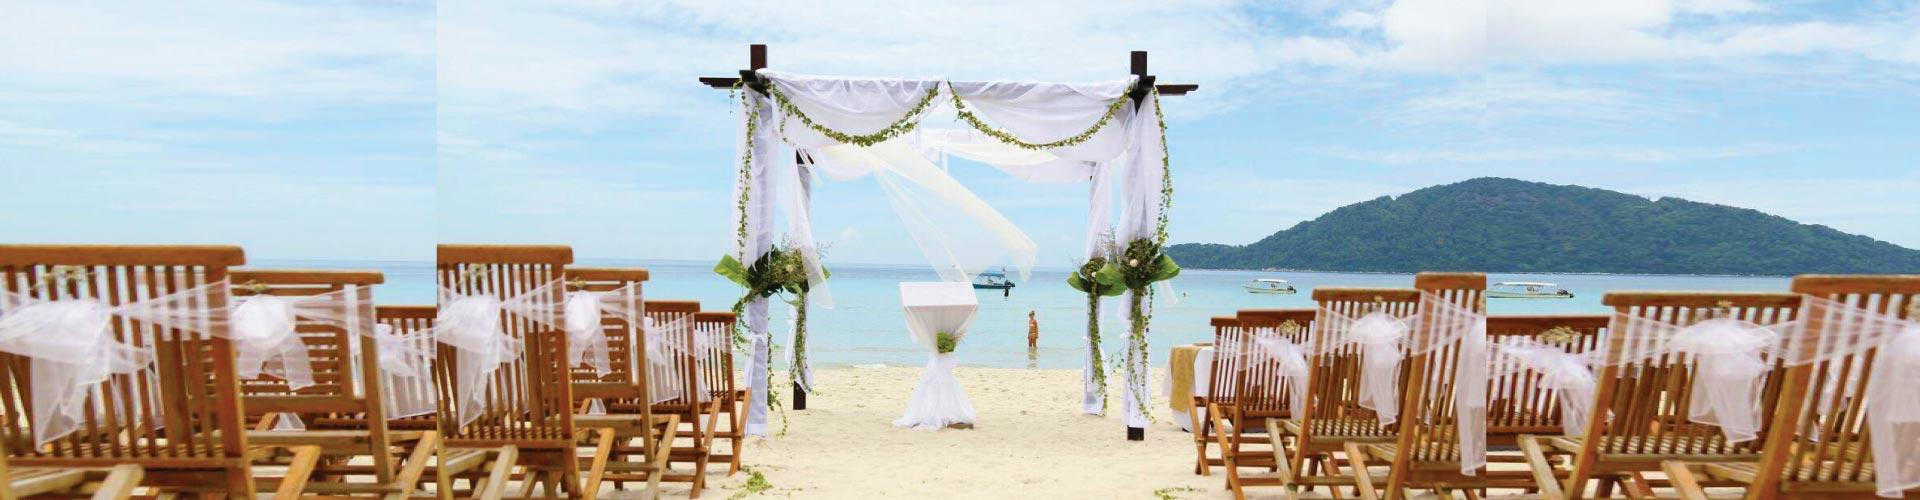 Perhentian Island Honeymoon Package @ Bubu Villa